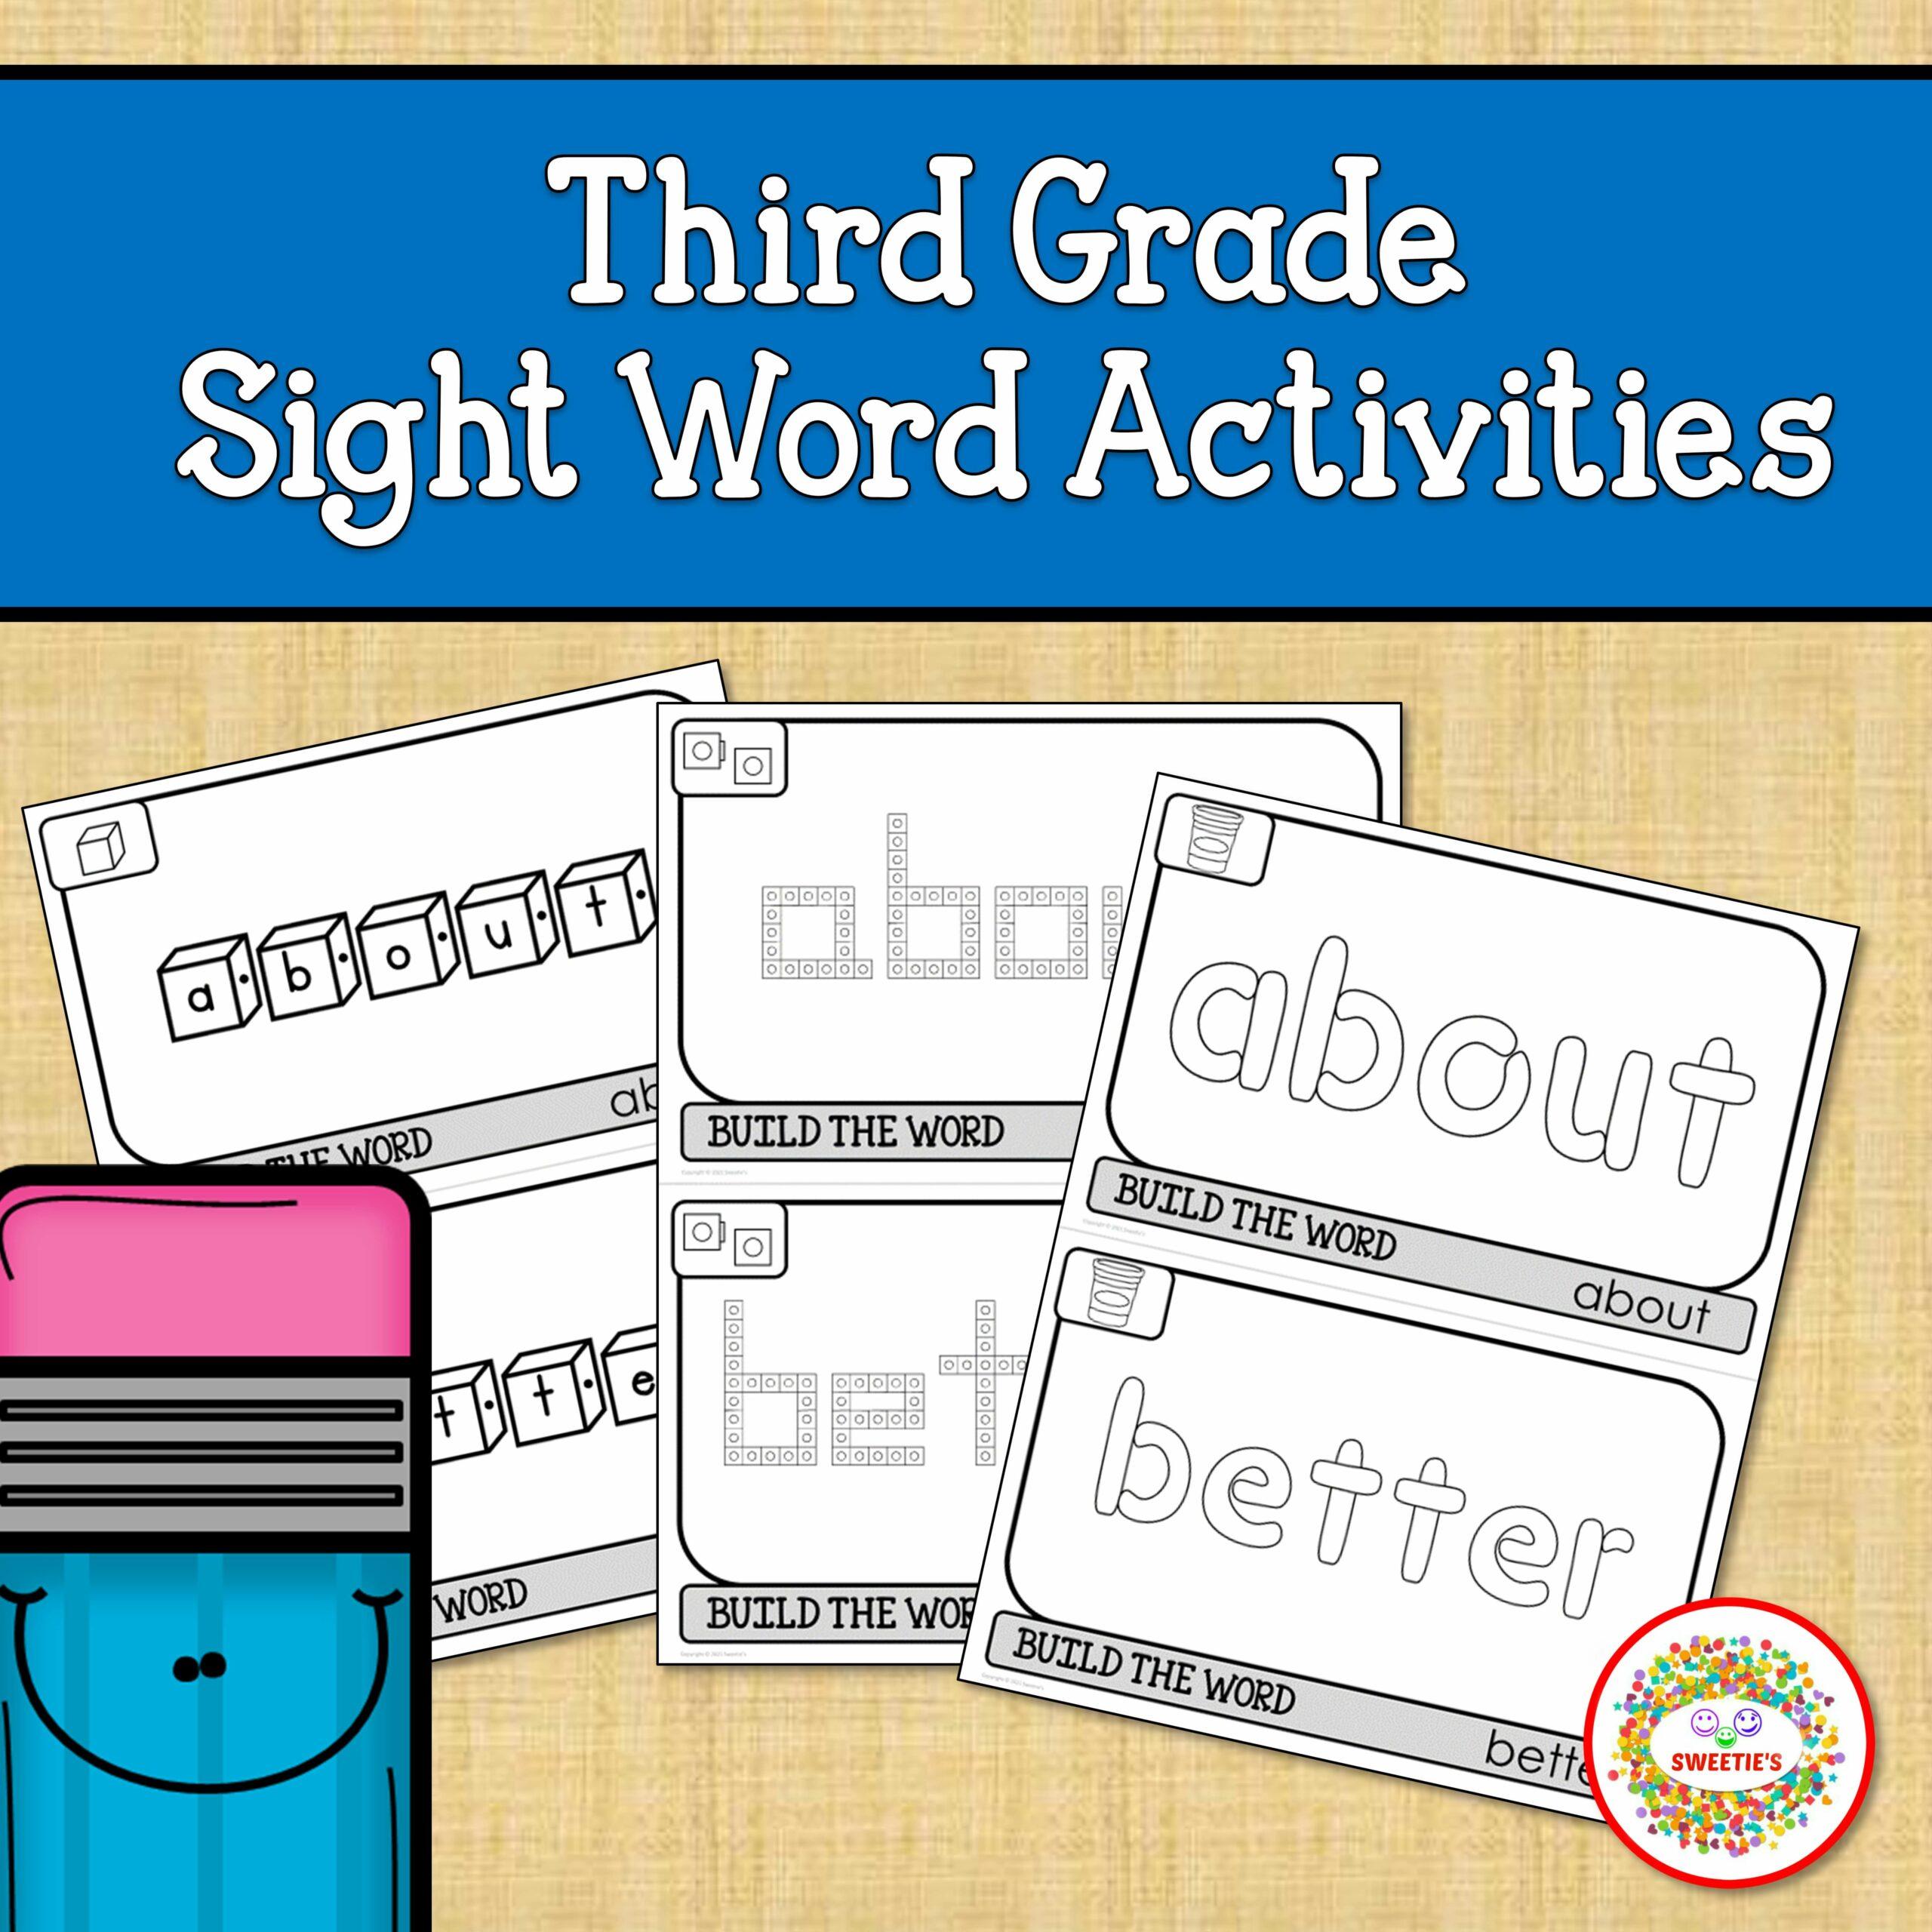 Third Grade Sight Words Activities